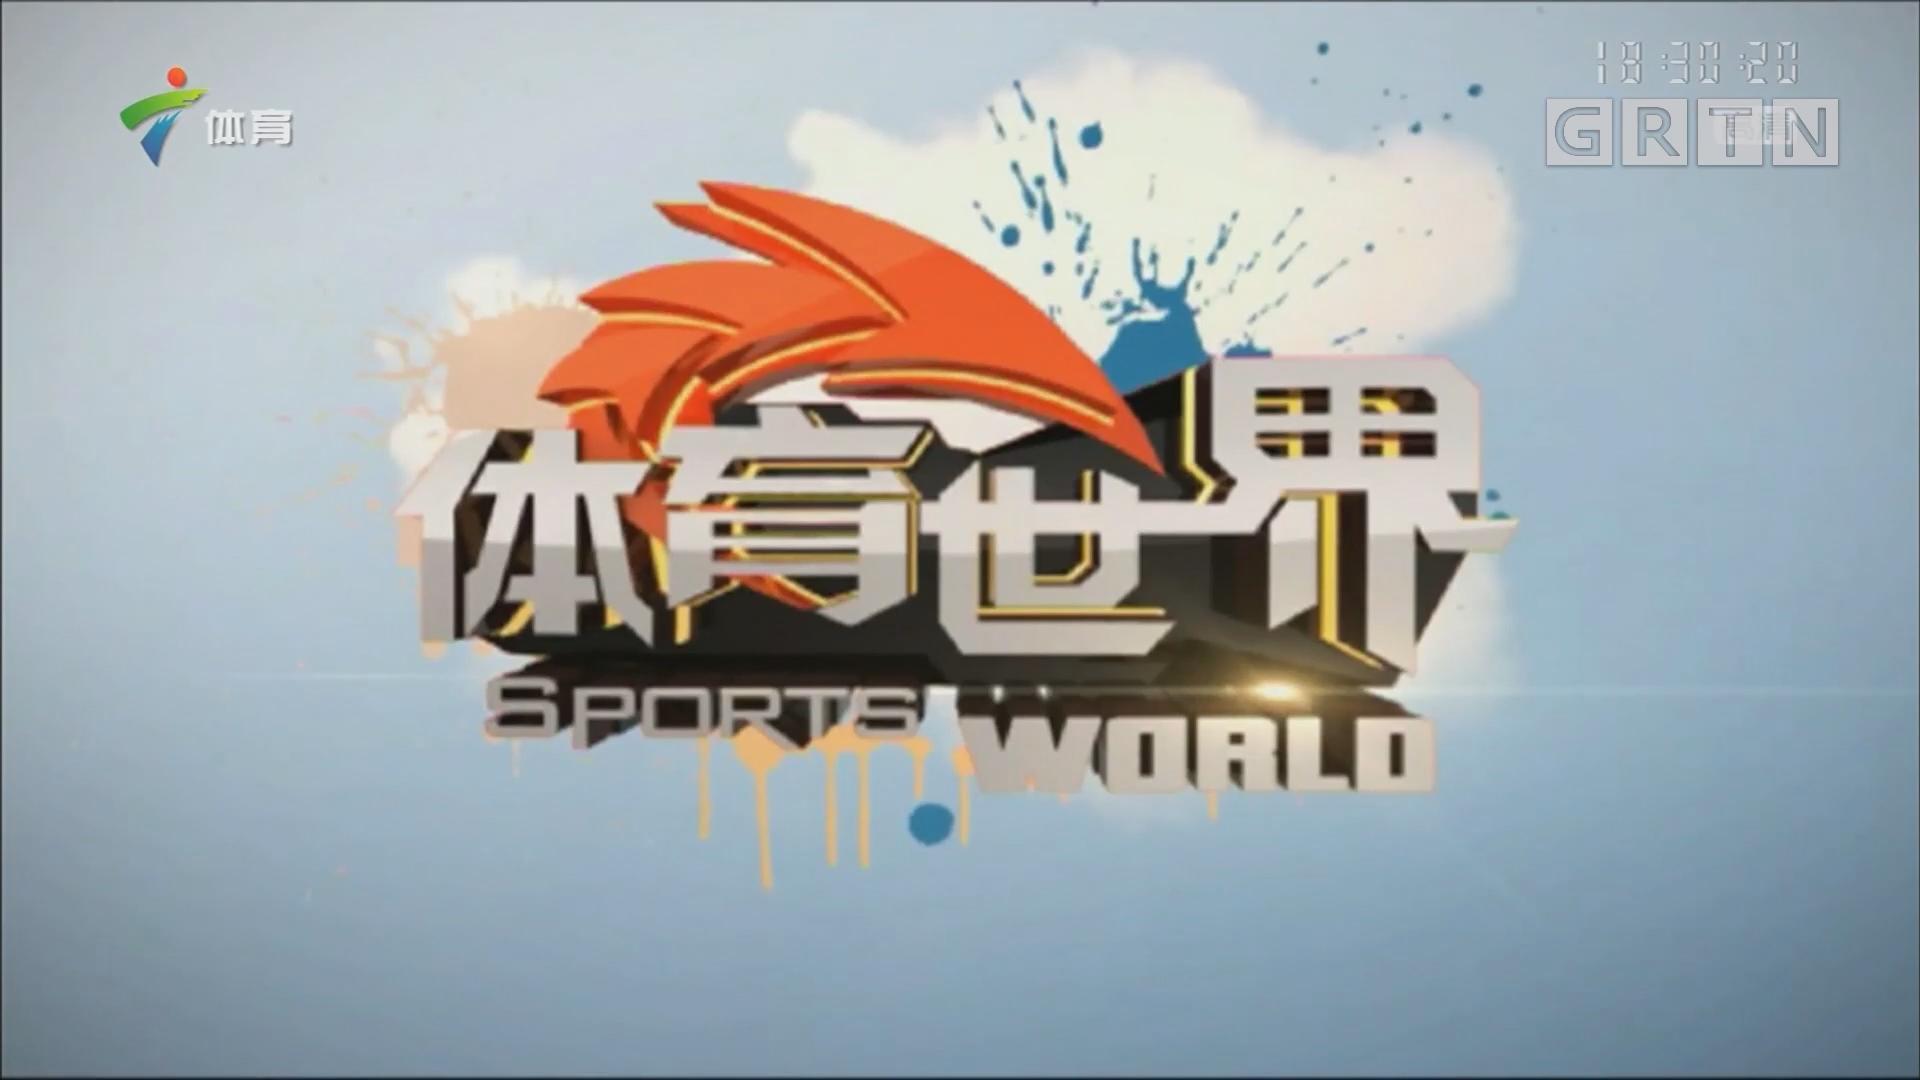 [HD][2017-08-17]体育世界:马拉松亚锦赛暨莞马新闻发布会今天举行